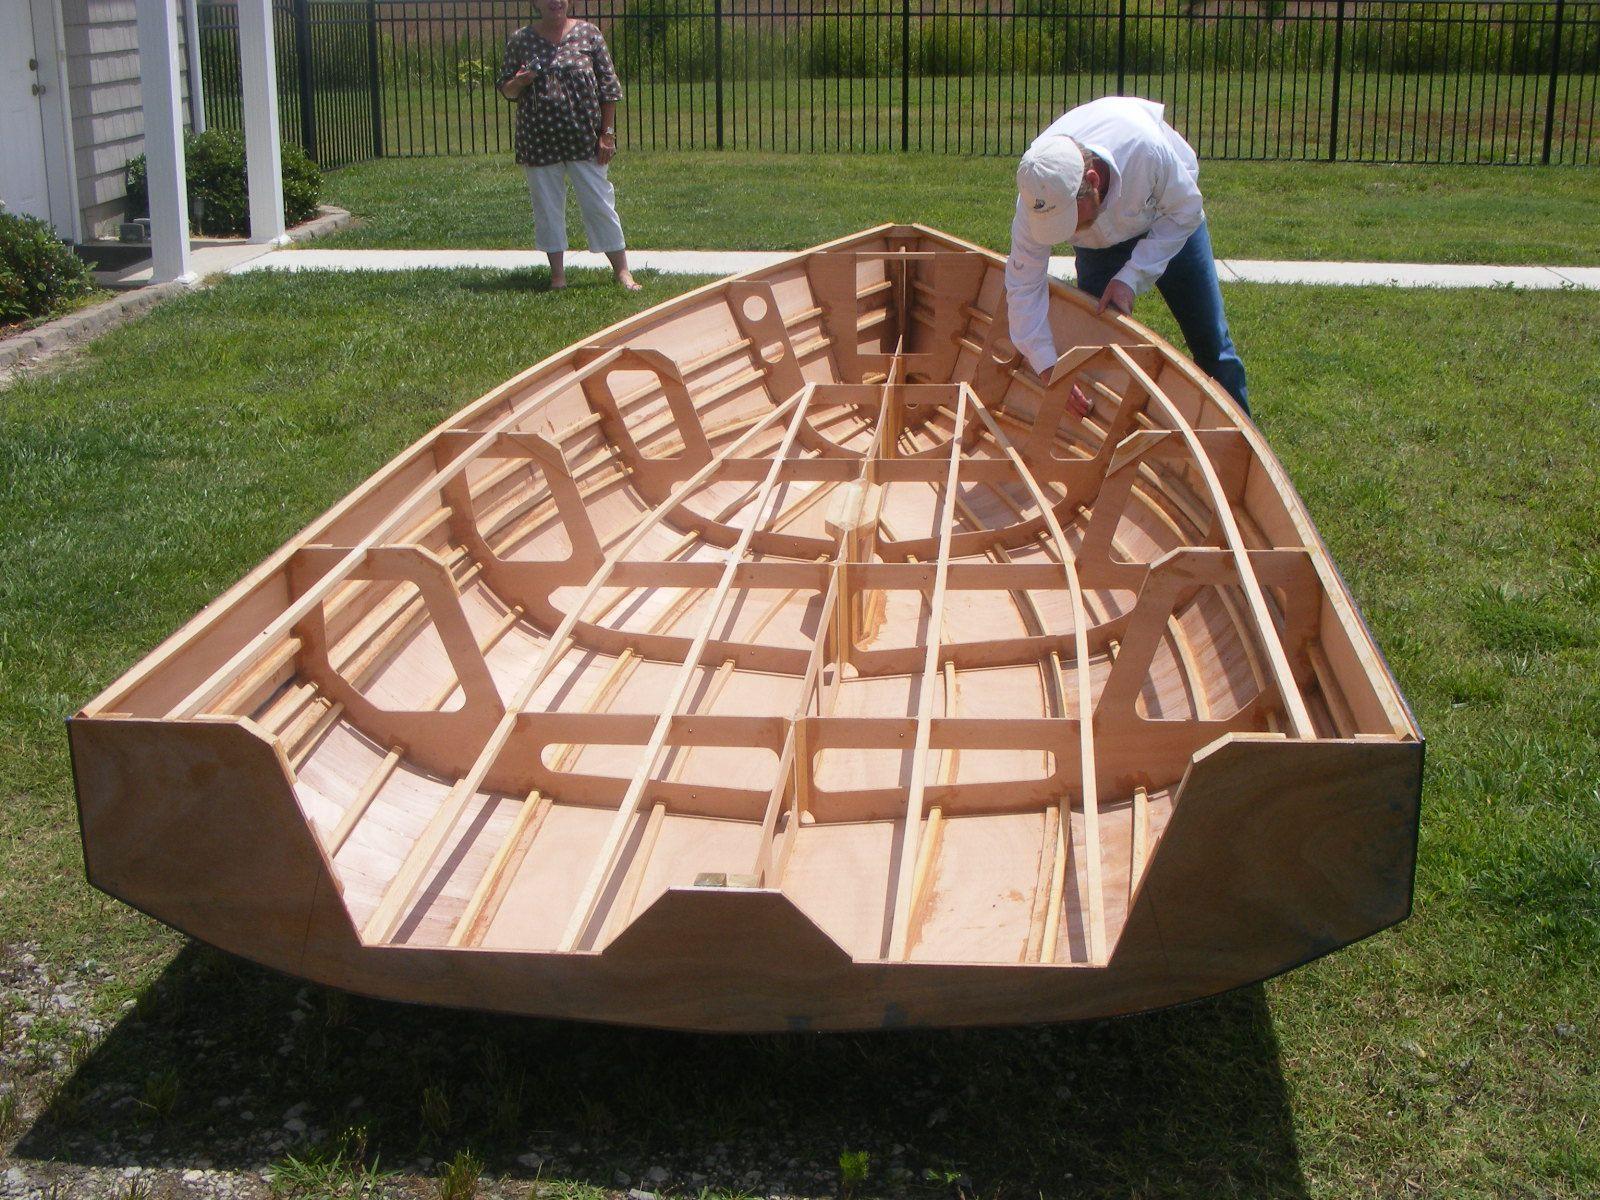 skiff plans | Lumber yard skiff - On Board with Mark Corke | boats ...